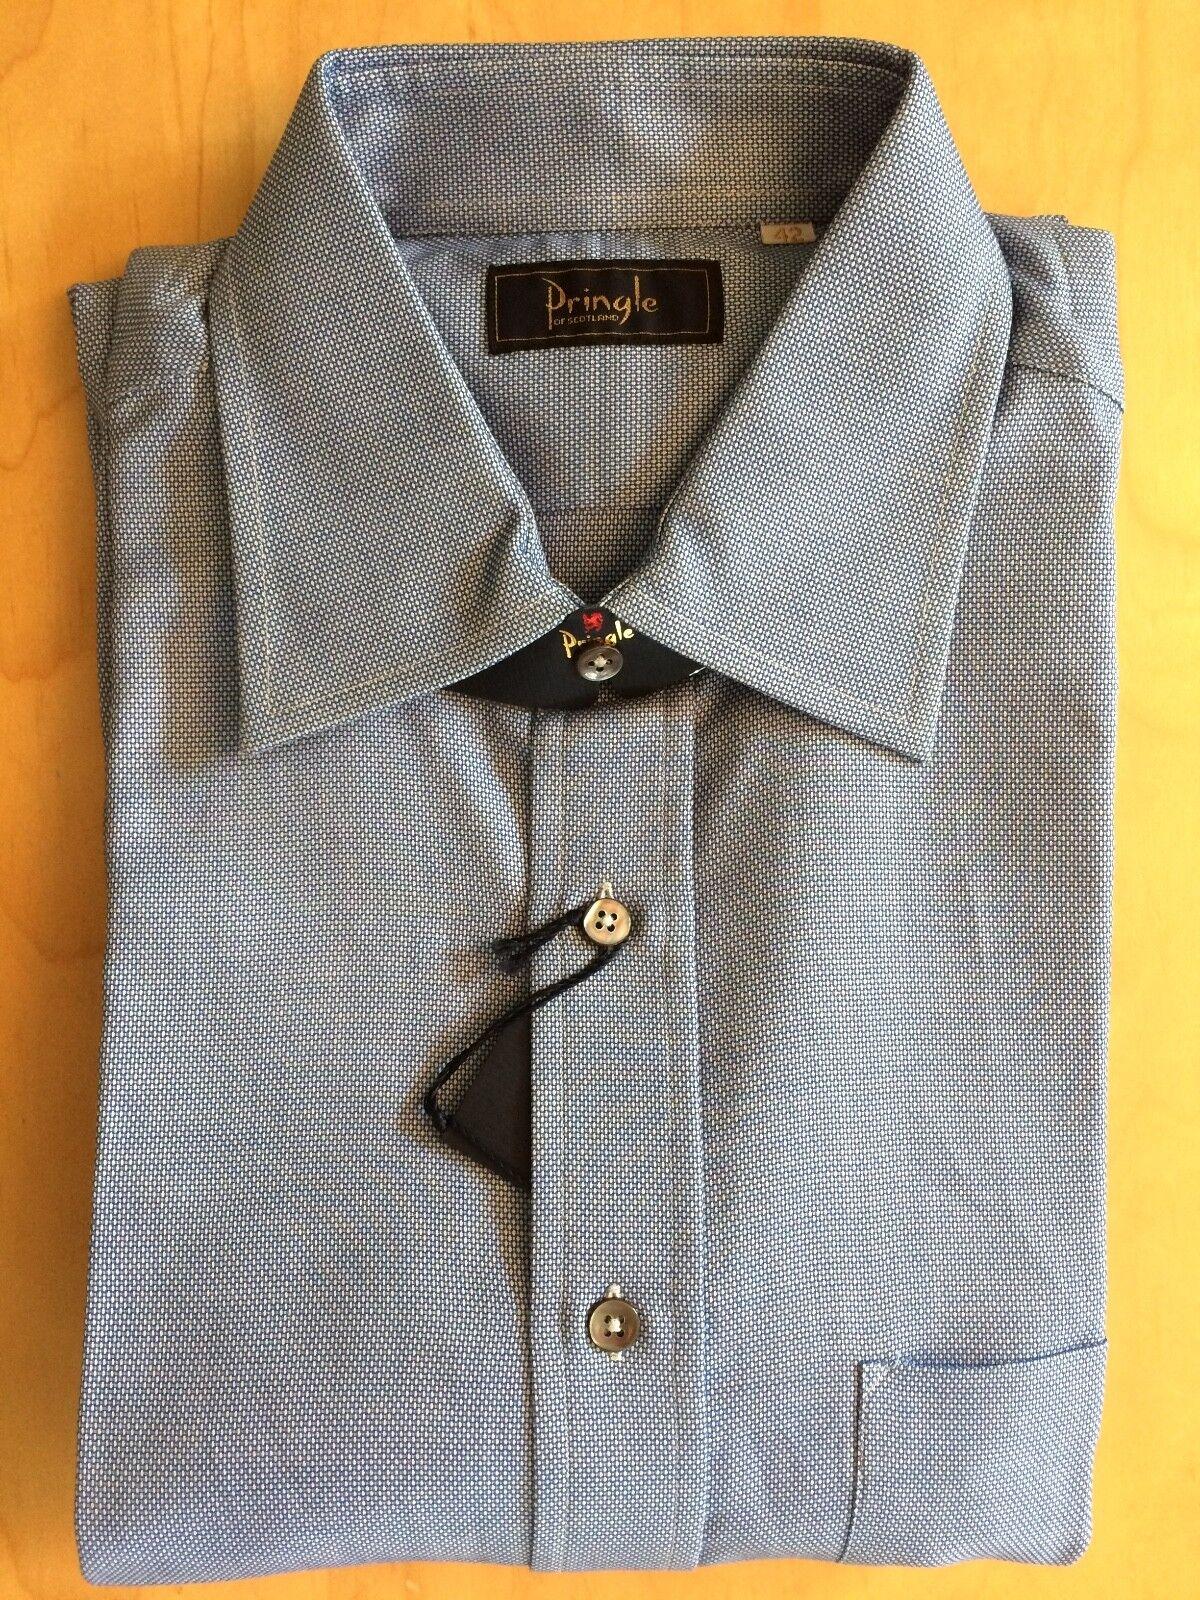 Men's Pringle of Scotland bluee Button-Up Shirt size 42 L